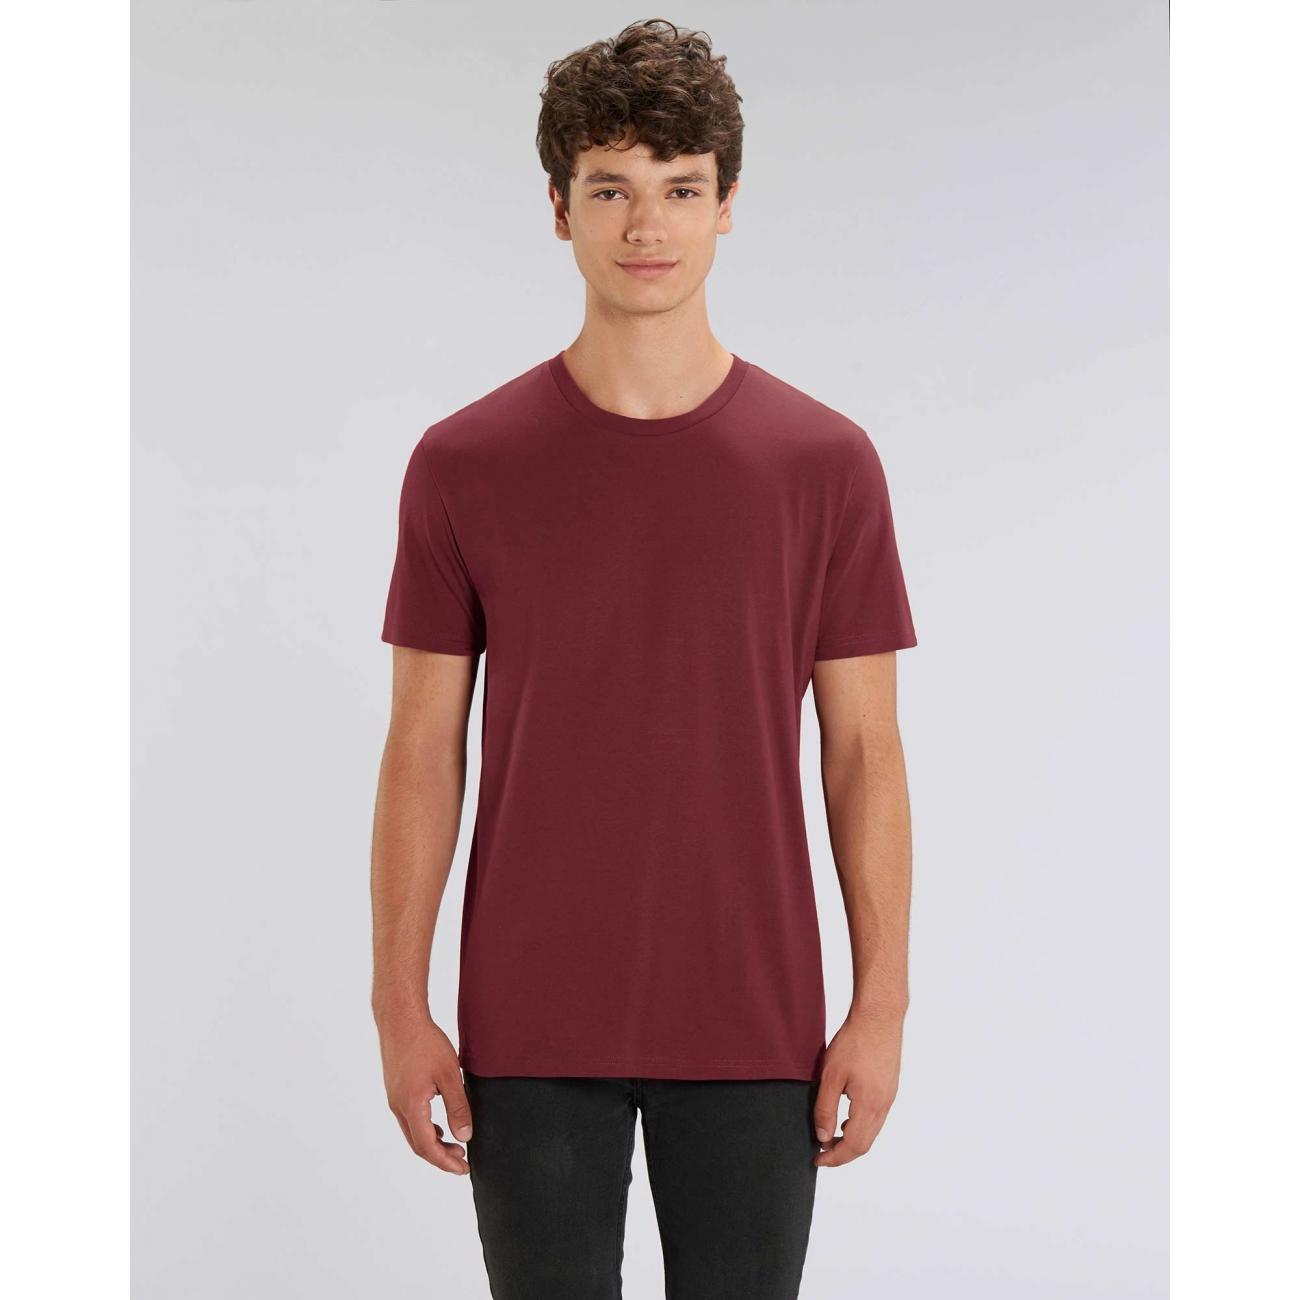 https://tee-shirt-bio.com/9414-thickbox_default/tee-shirt-coton-bio-col-rond-bordeaux-classique.jpg